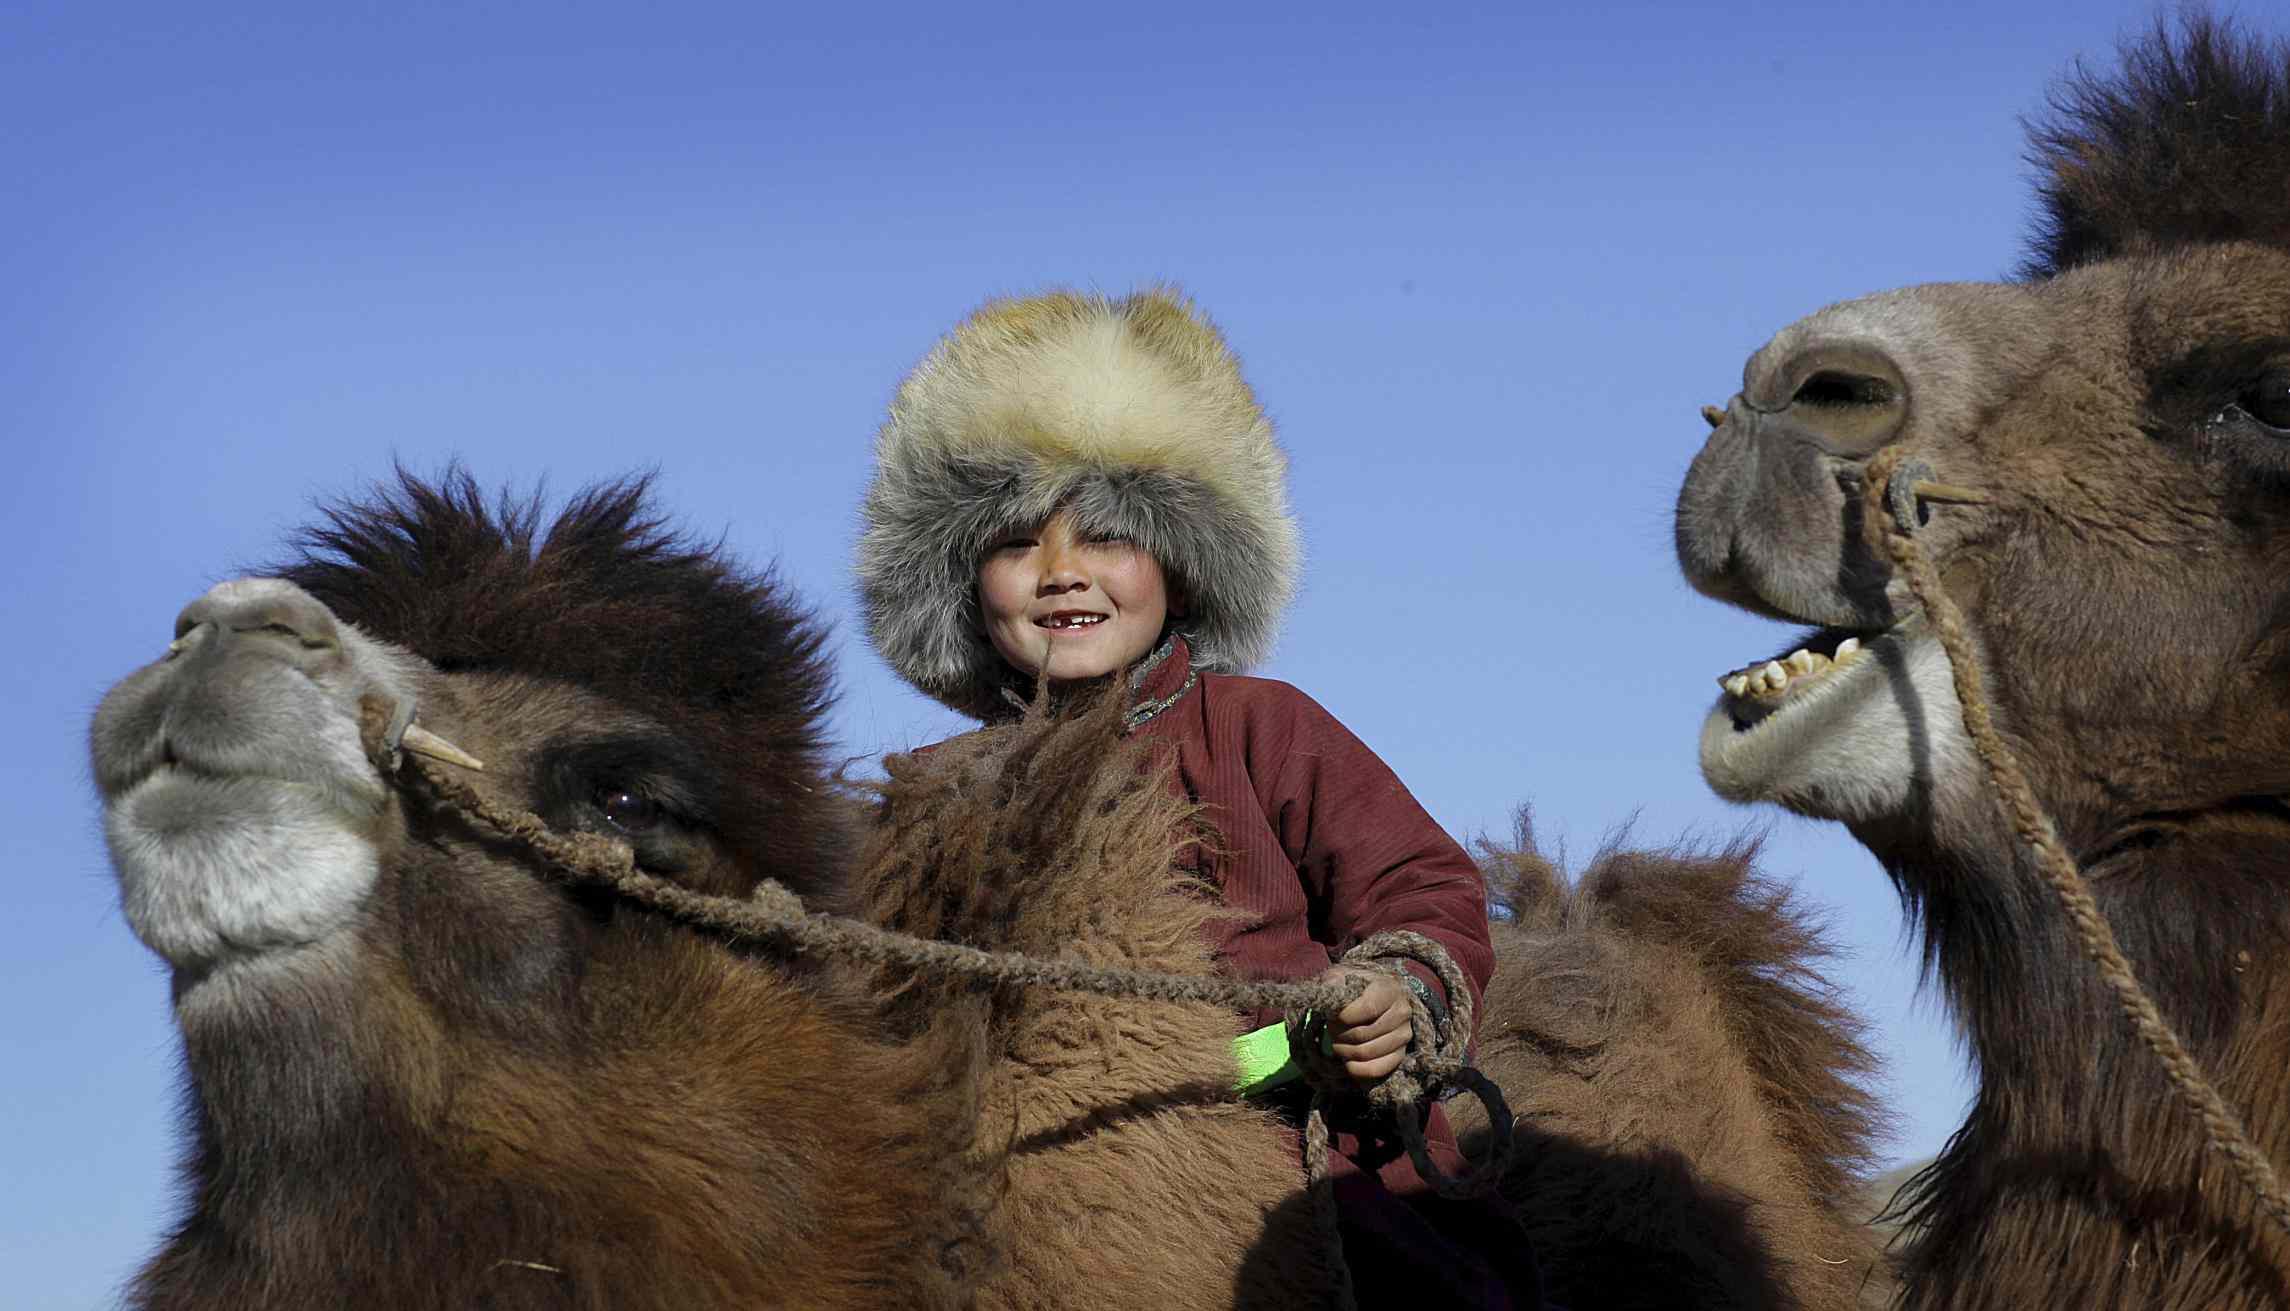 Mongolian child rides a Bactrian camel